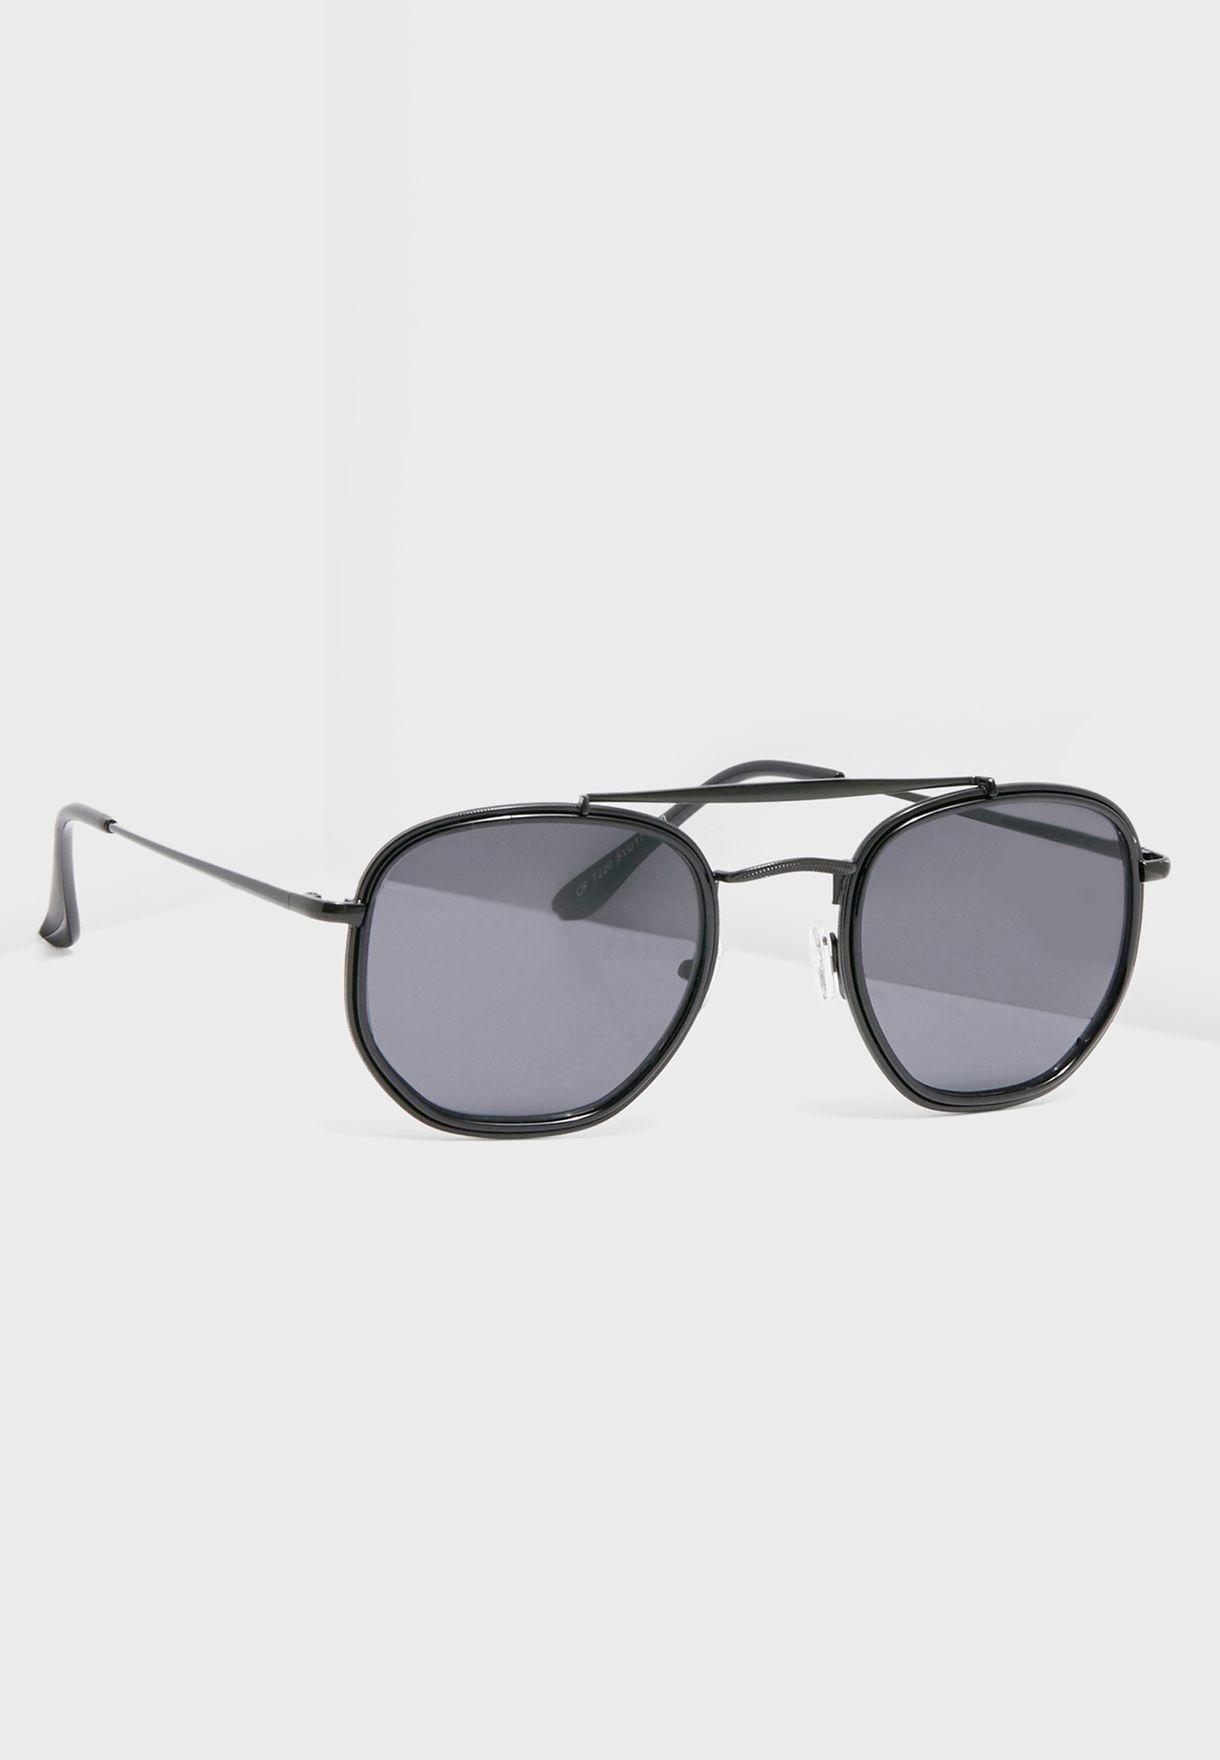 2a5a3e24e9 Shop Seventy five black Classic Square Aviator Sunglasses 7220 for Men in  UAE - 11136AC82OIP